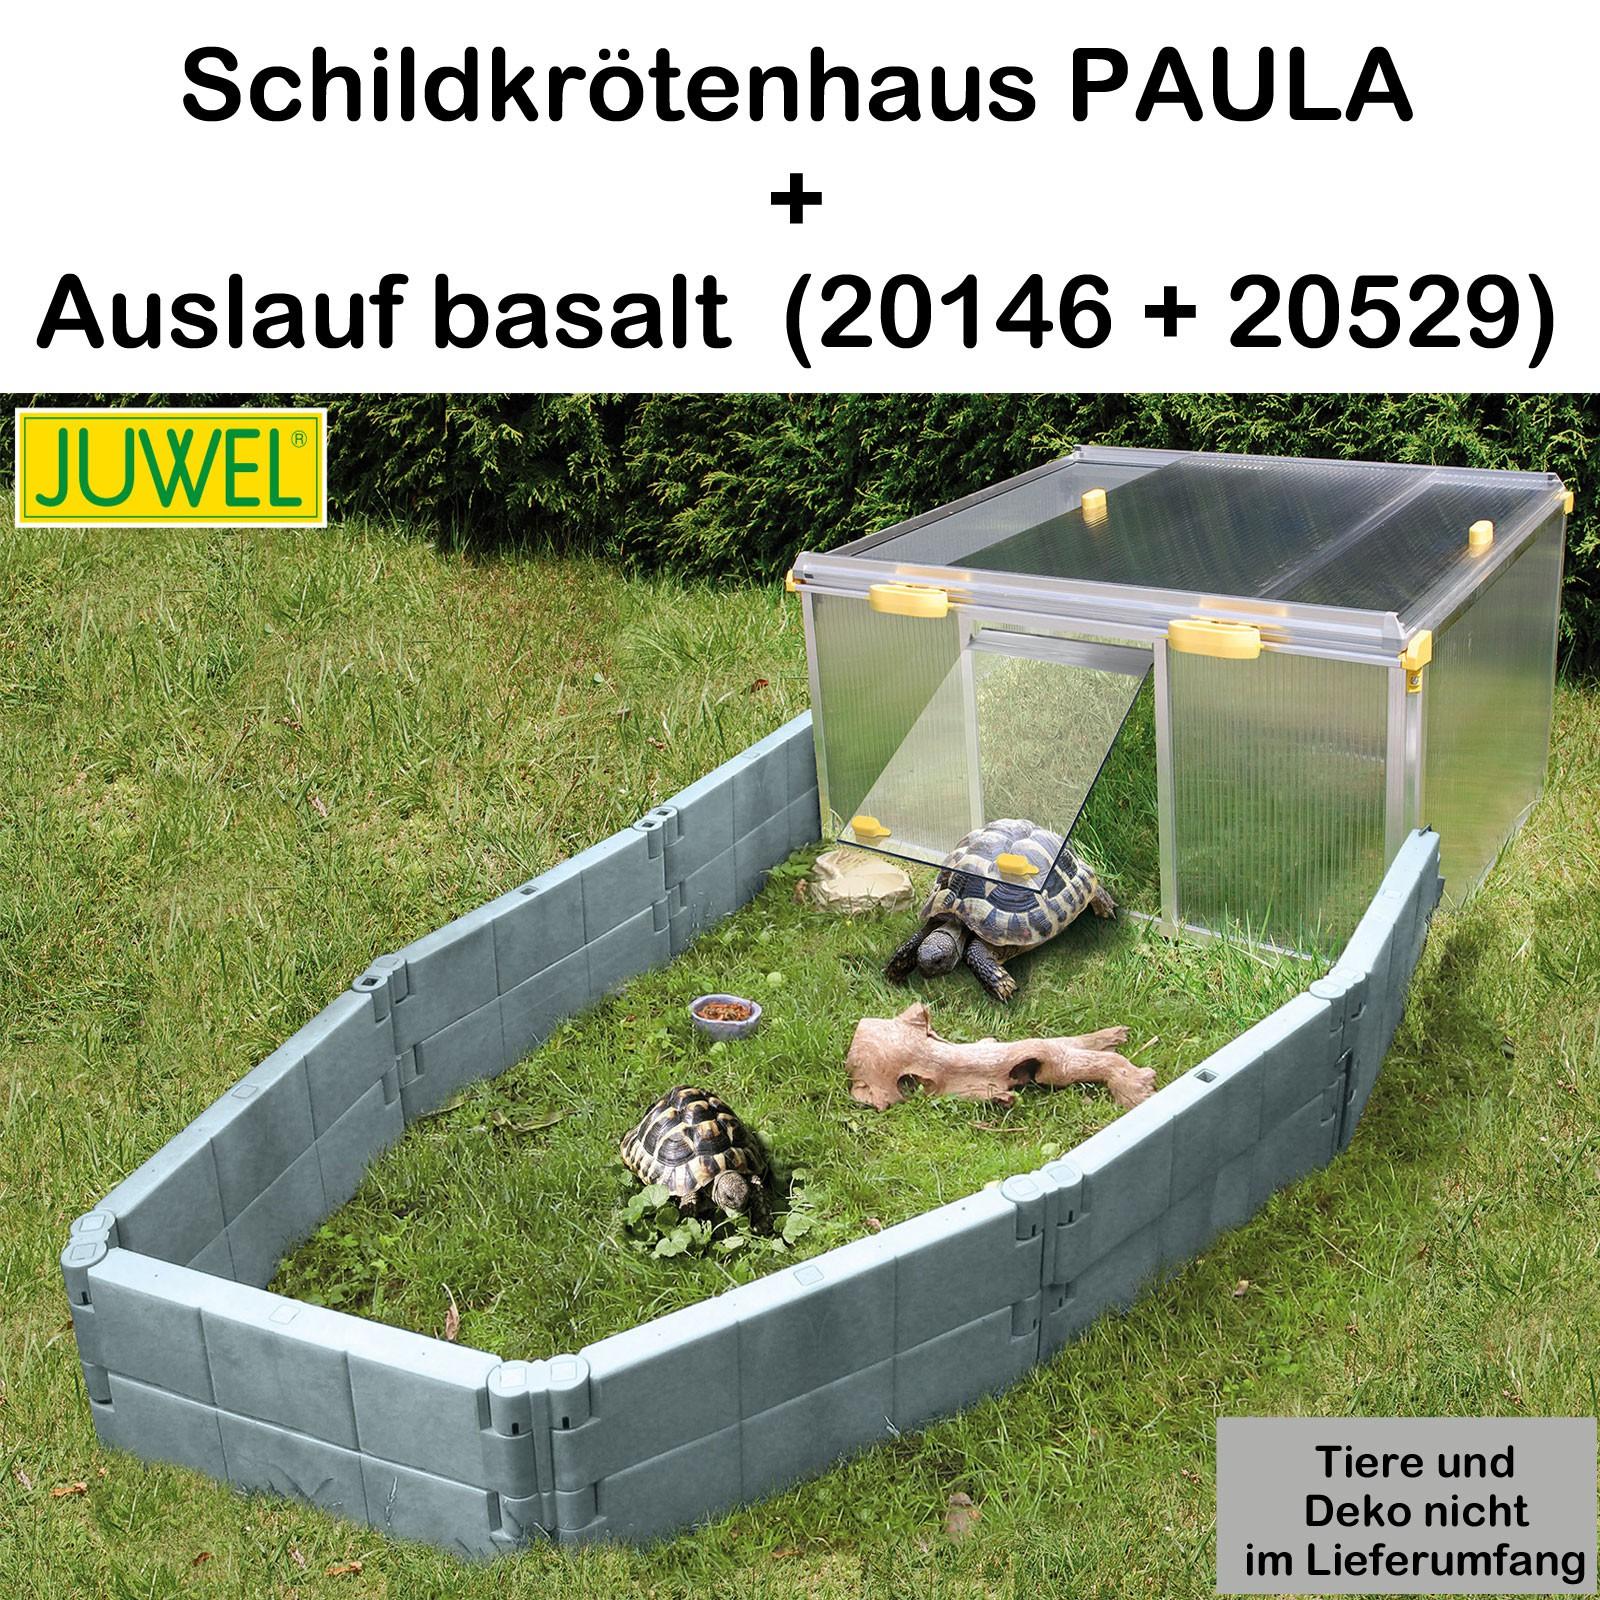 Juwel Schildkrötenhaus PAULA m./o. Zubehör Anbausatz Freigehege var-juwel-paula